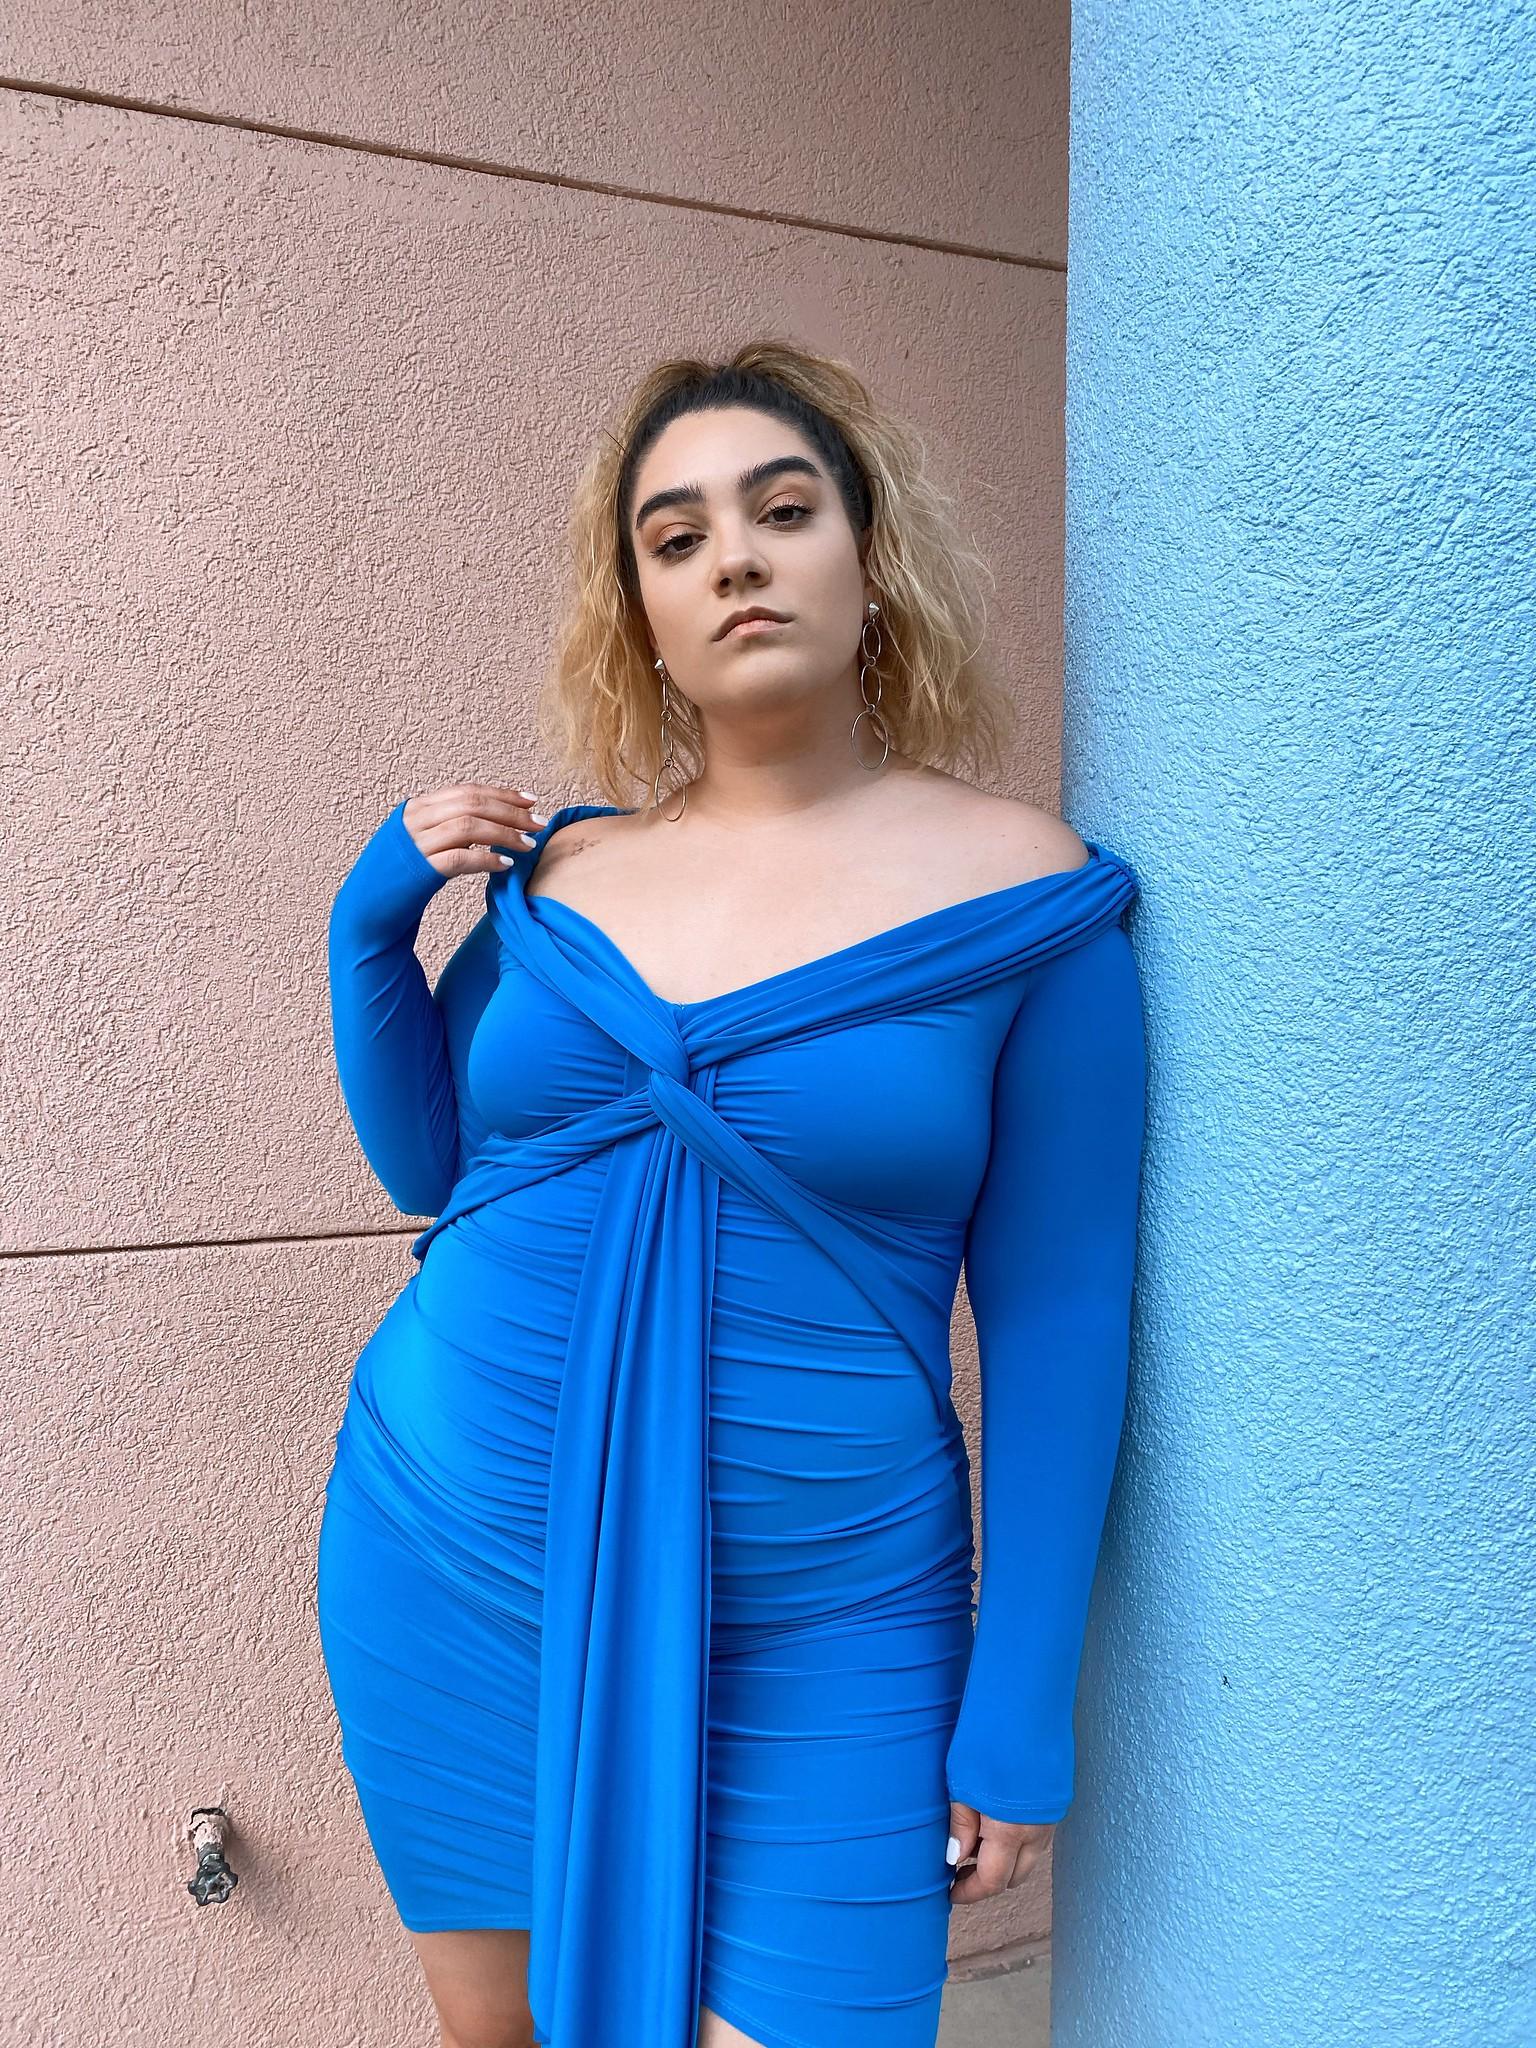 nadia aboulhosn blue dress